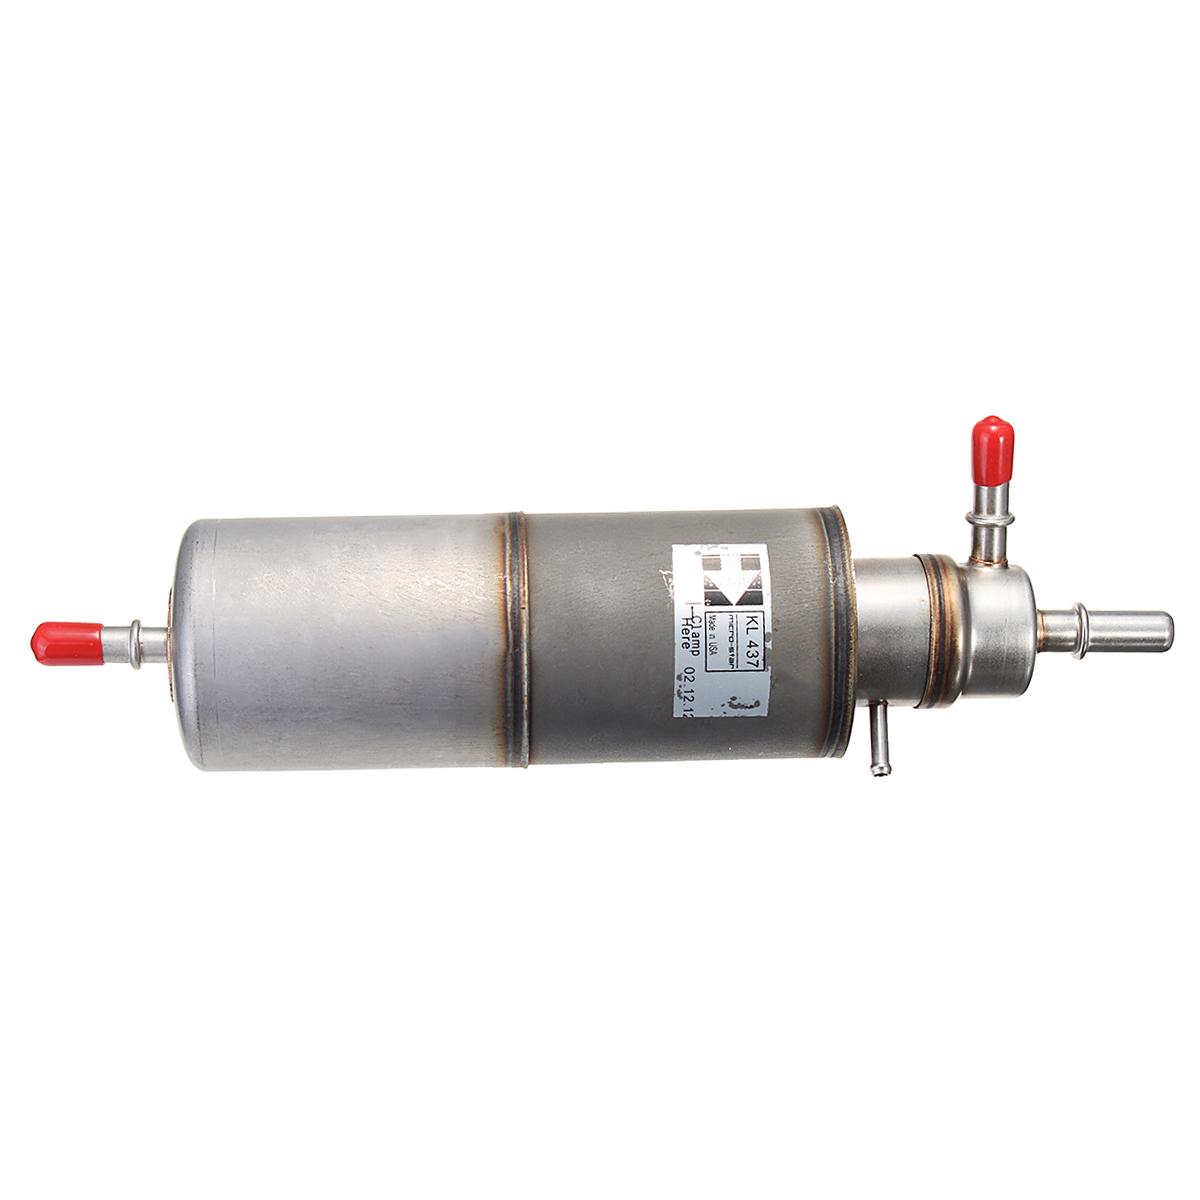 new oil fuel filter for mercedes model ml55 amg ml320 ... ml fuel filter